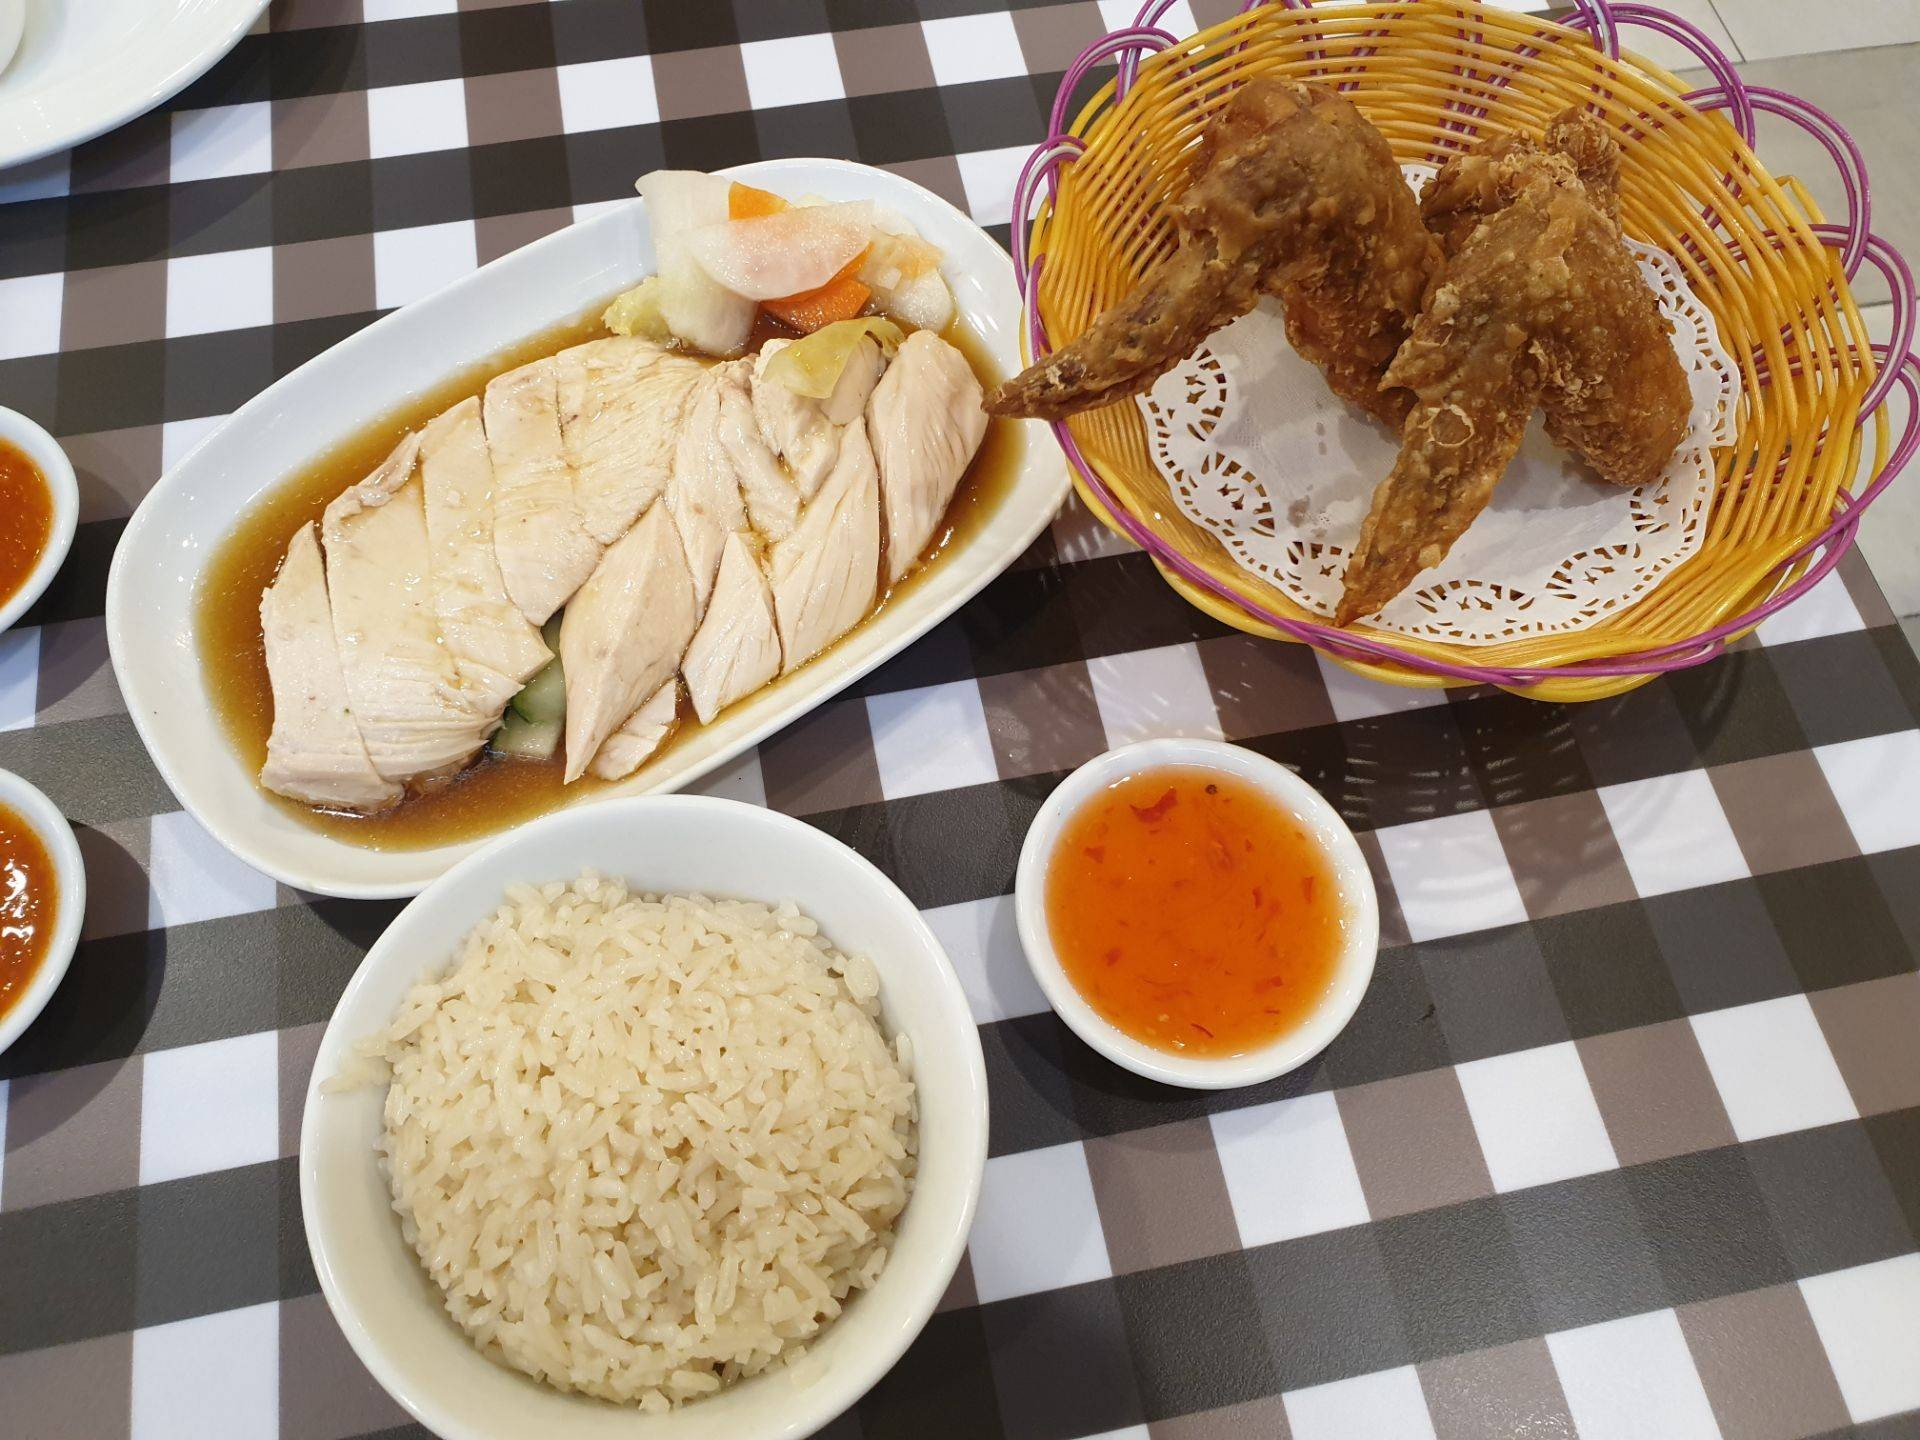 Boon Tong Kee เซ็นทรัลพลาซ่า แกรนด์ พระราม 9